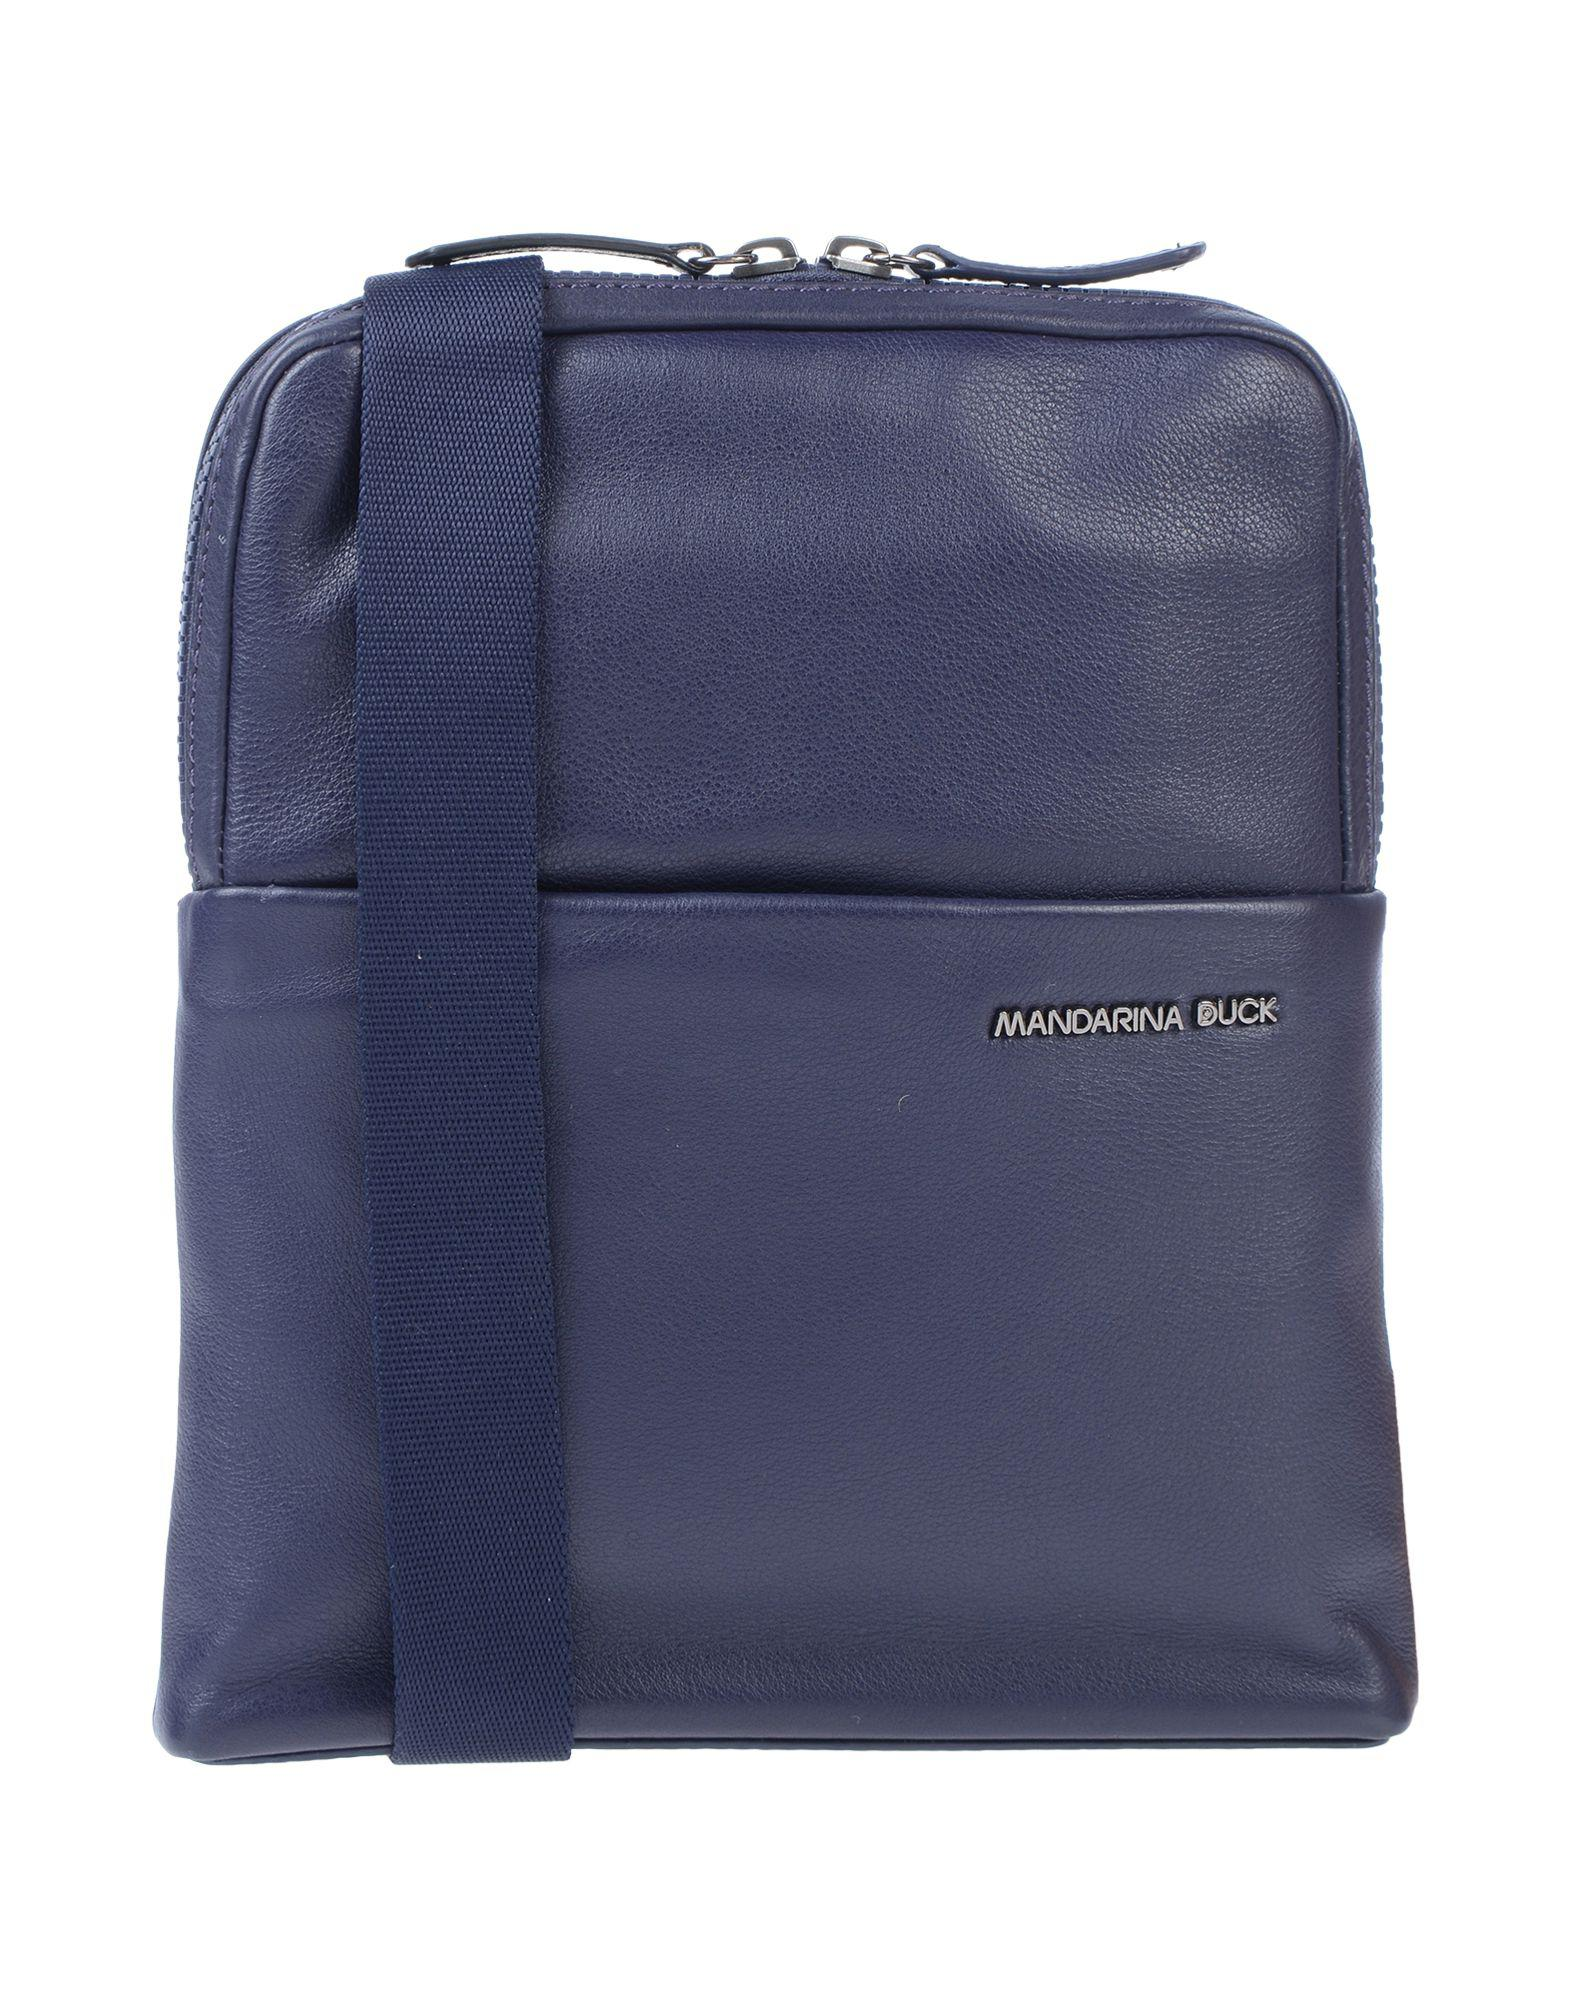 5633820f8 Mandarina Duck - Blue Bolso con bandolera for Men - Lyst. Ver en pantalla  completa